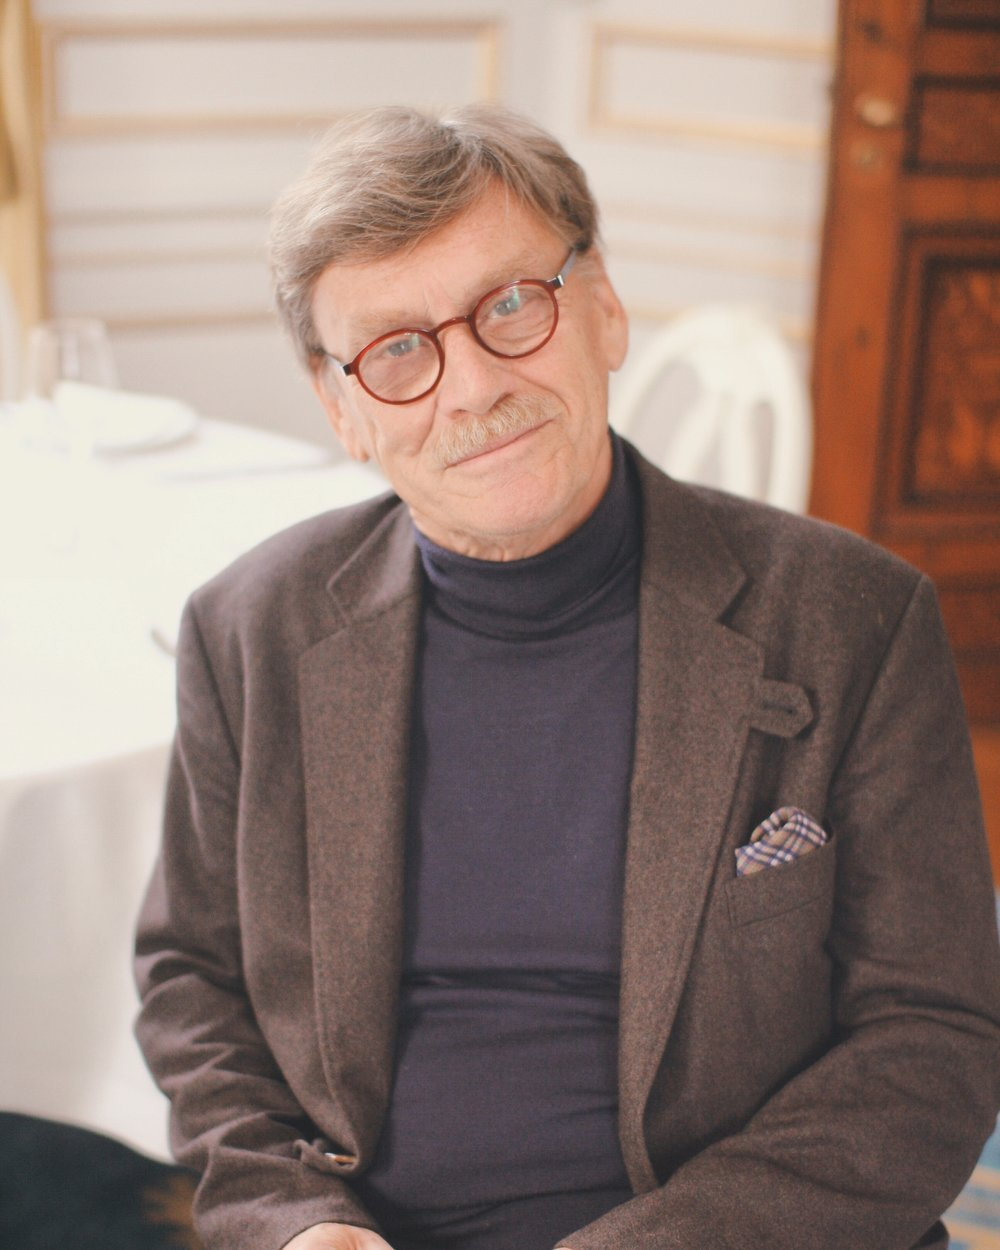 Lennart Koskinen  +46 70-860 71 45   lennart.koskinen@gaialeadership.com